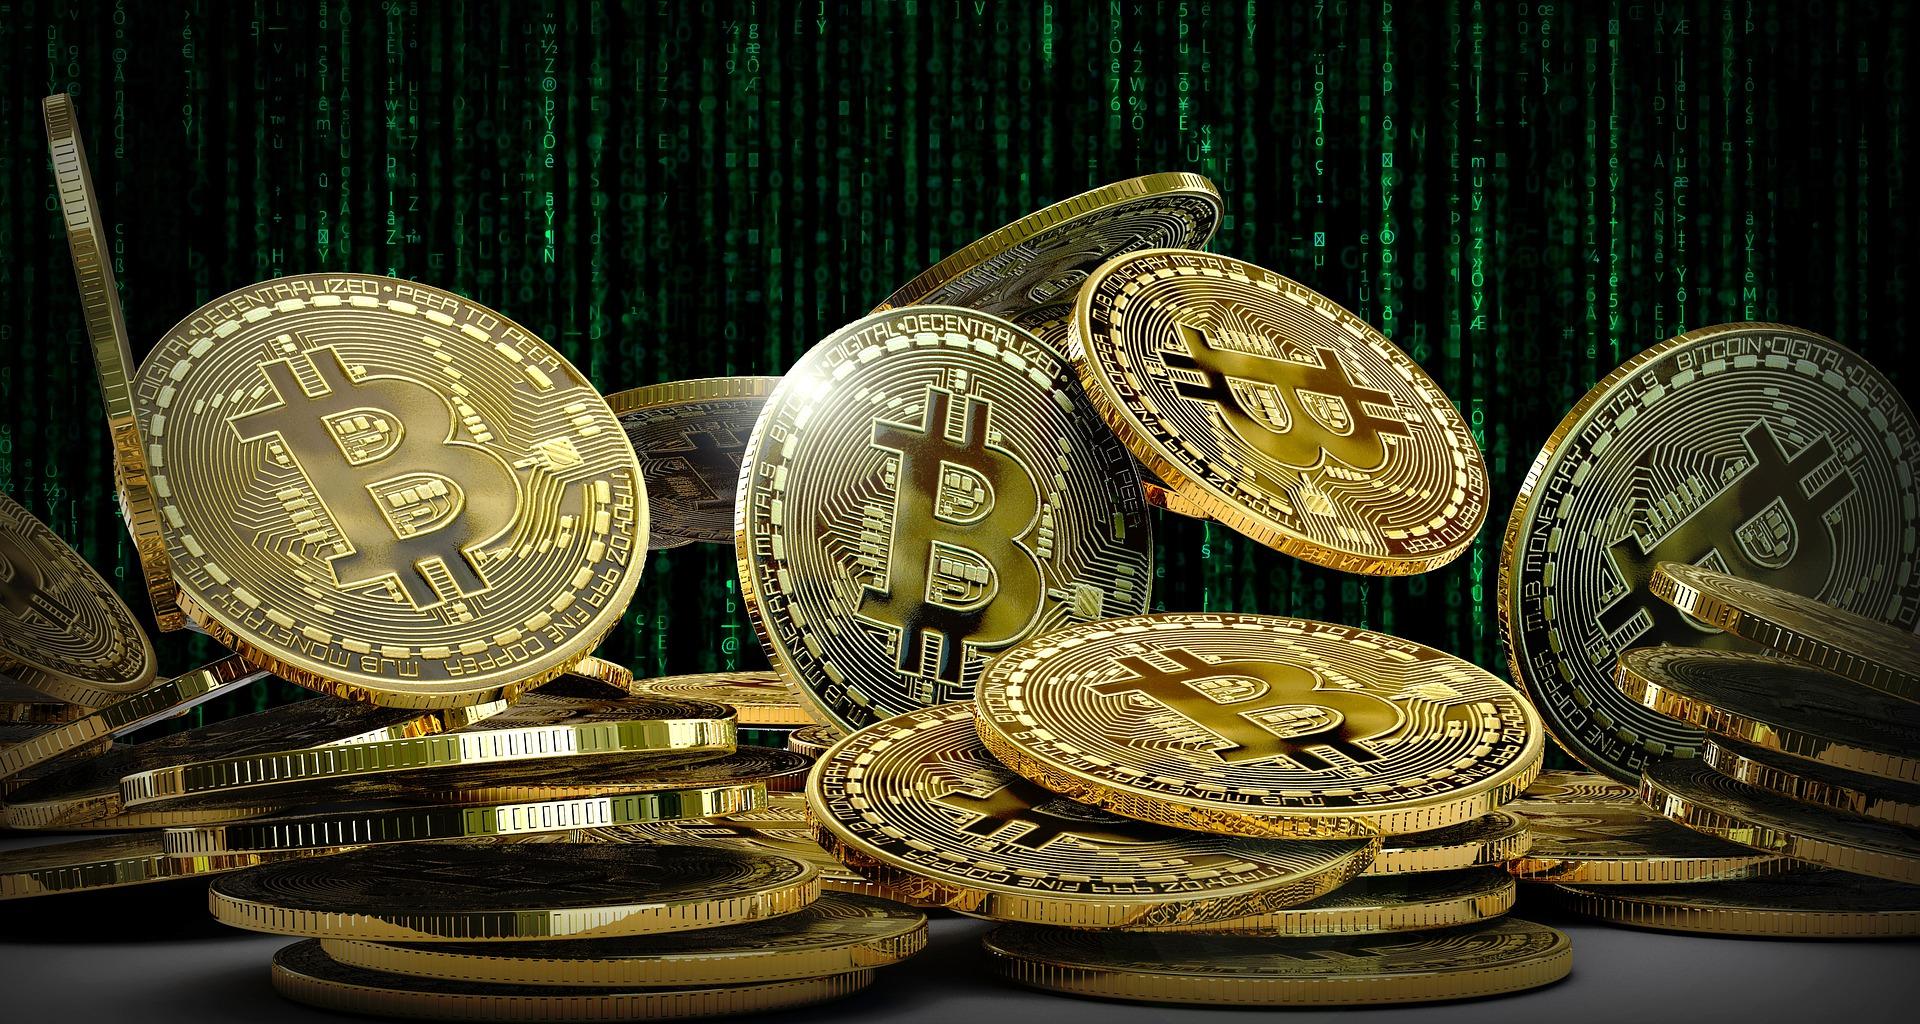 Bitcoinkoers boven de 12.000 euro